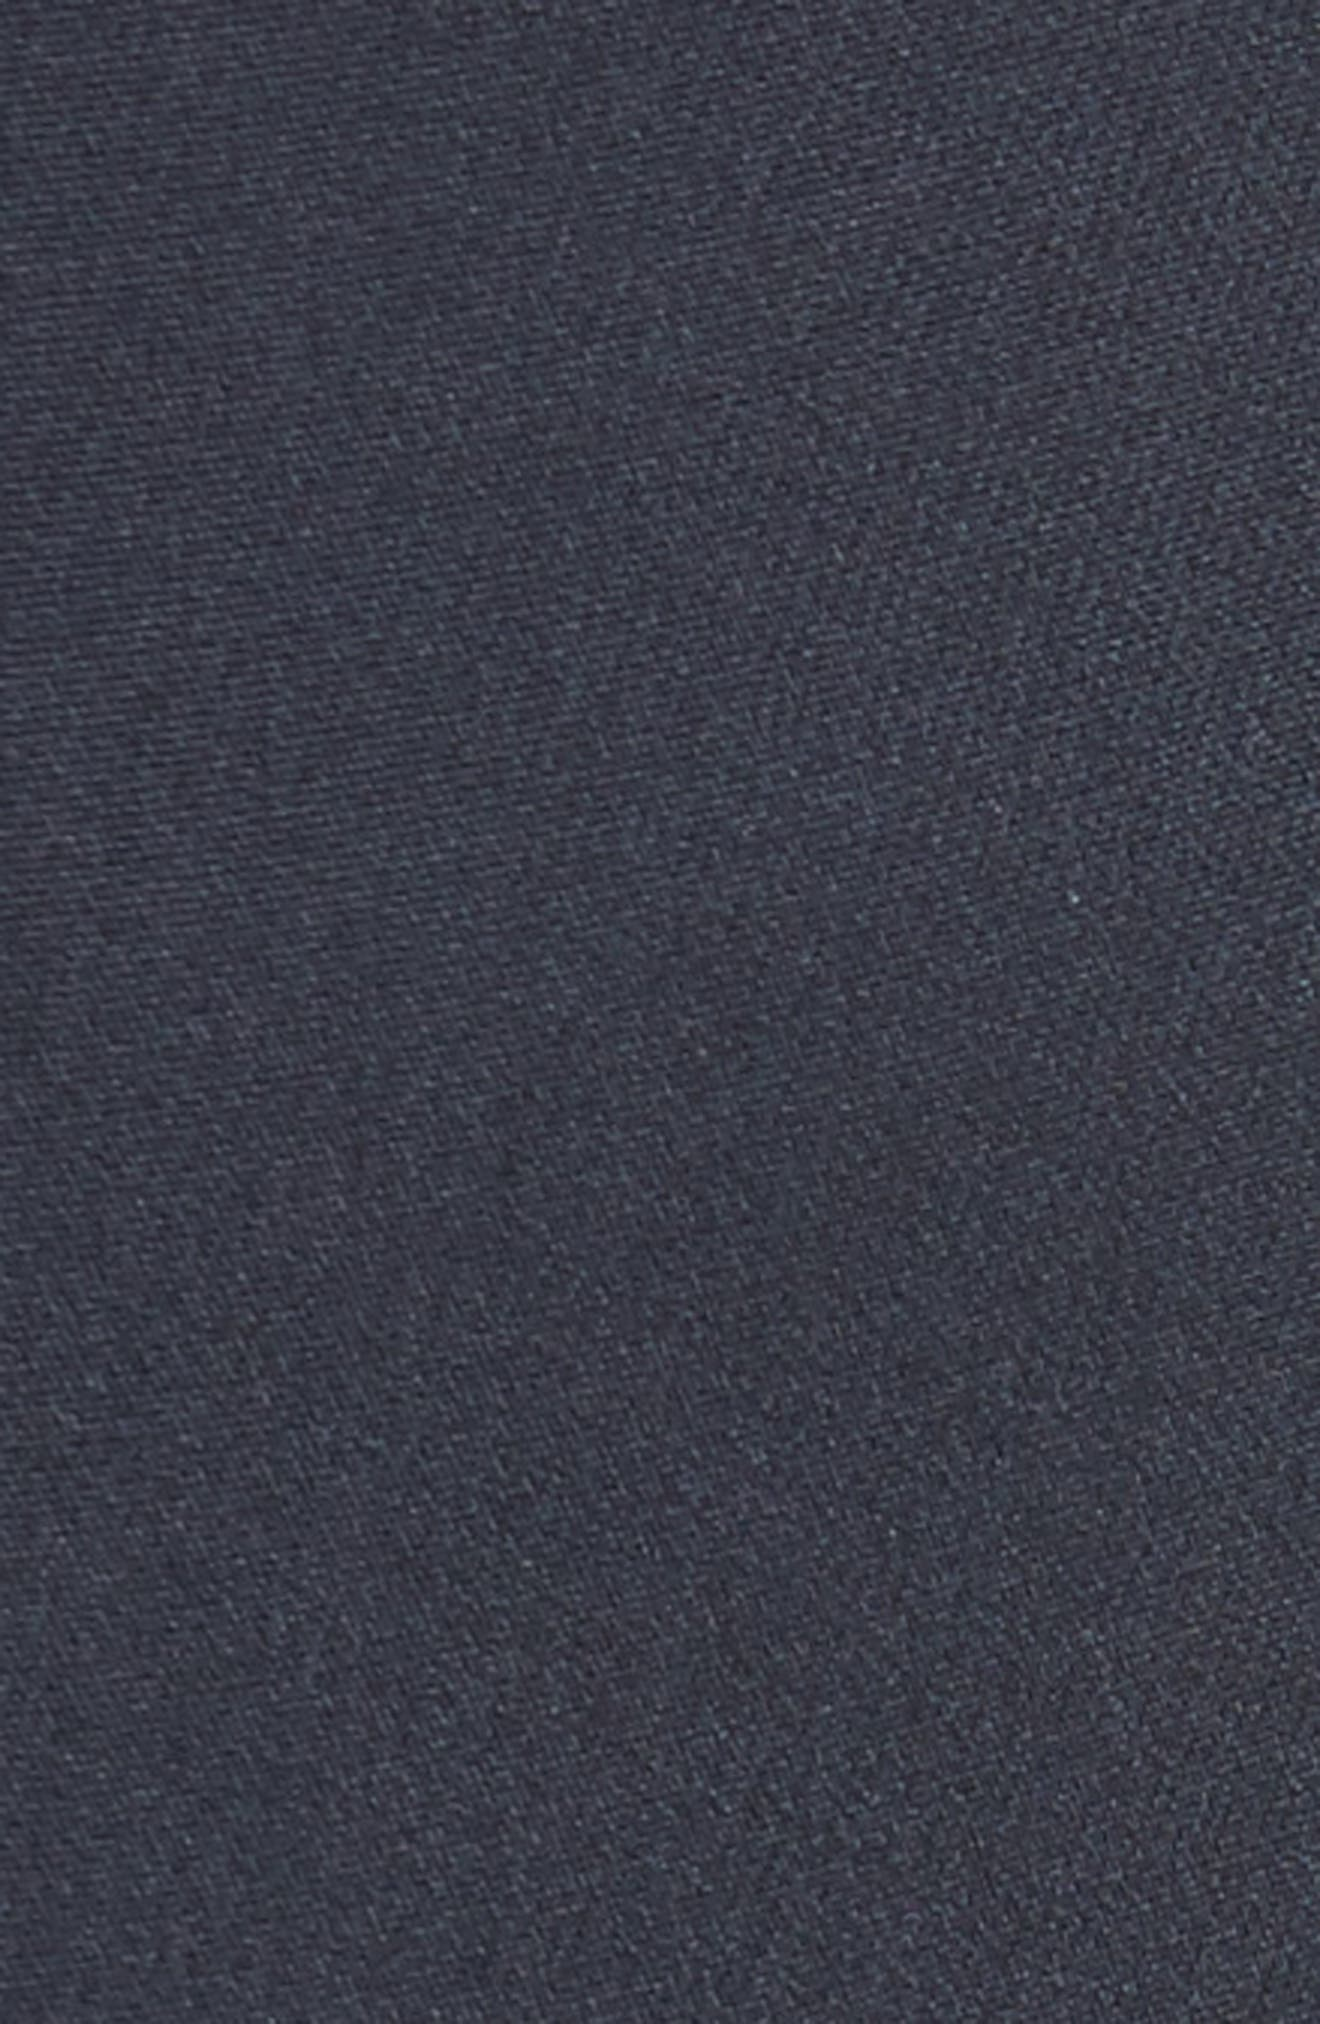 Stretch Crepe Cigarette Pants,                             Alternate thumbnail 5, color,                             Navy